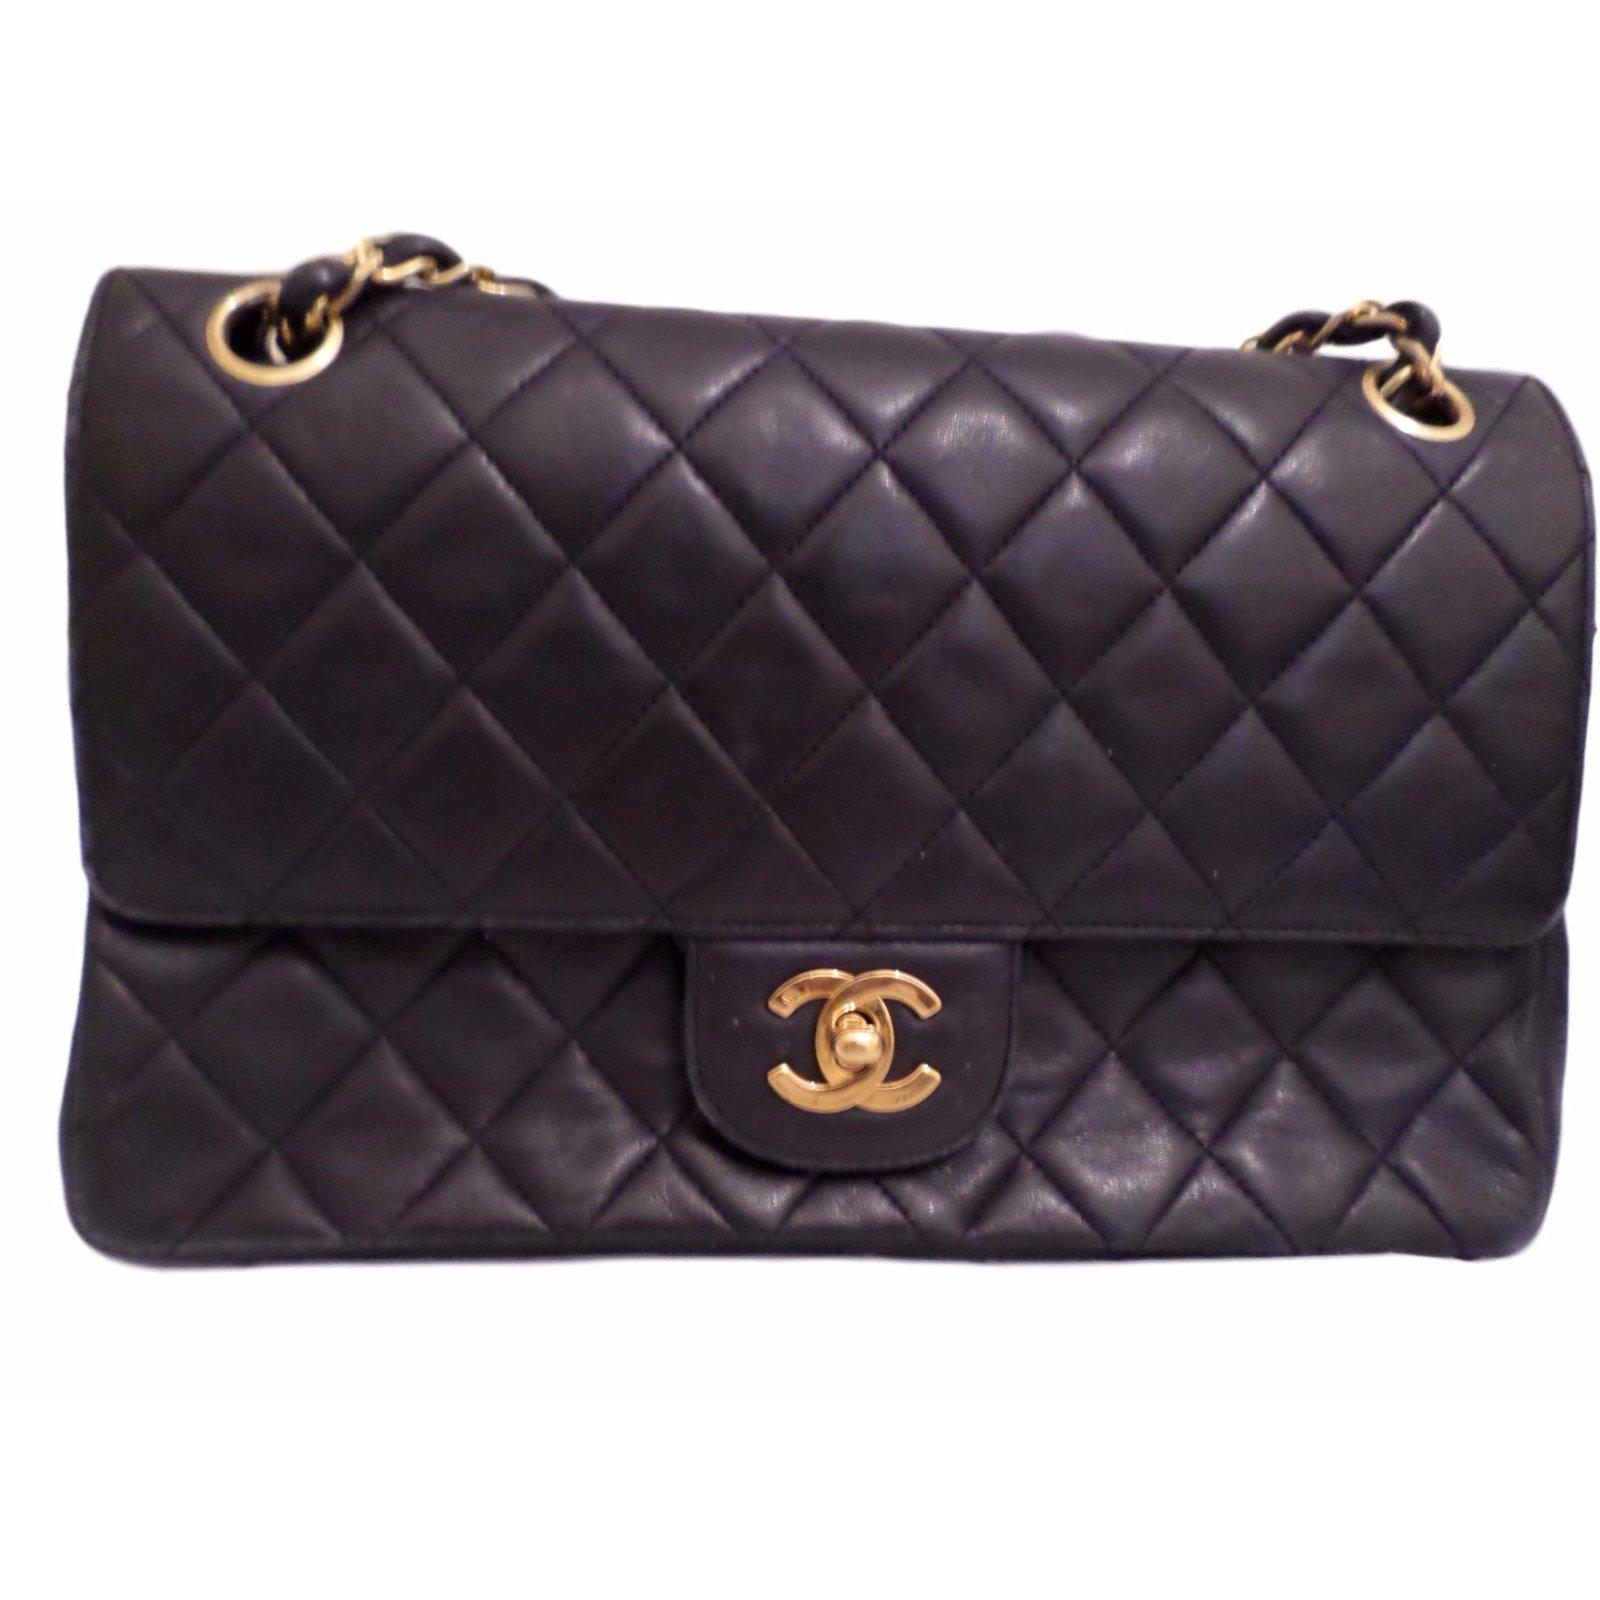 1e1d1e77a310 Chanel Classic Flap Bag Medium Lambskin | Stanford Center for ...